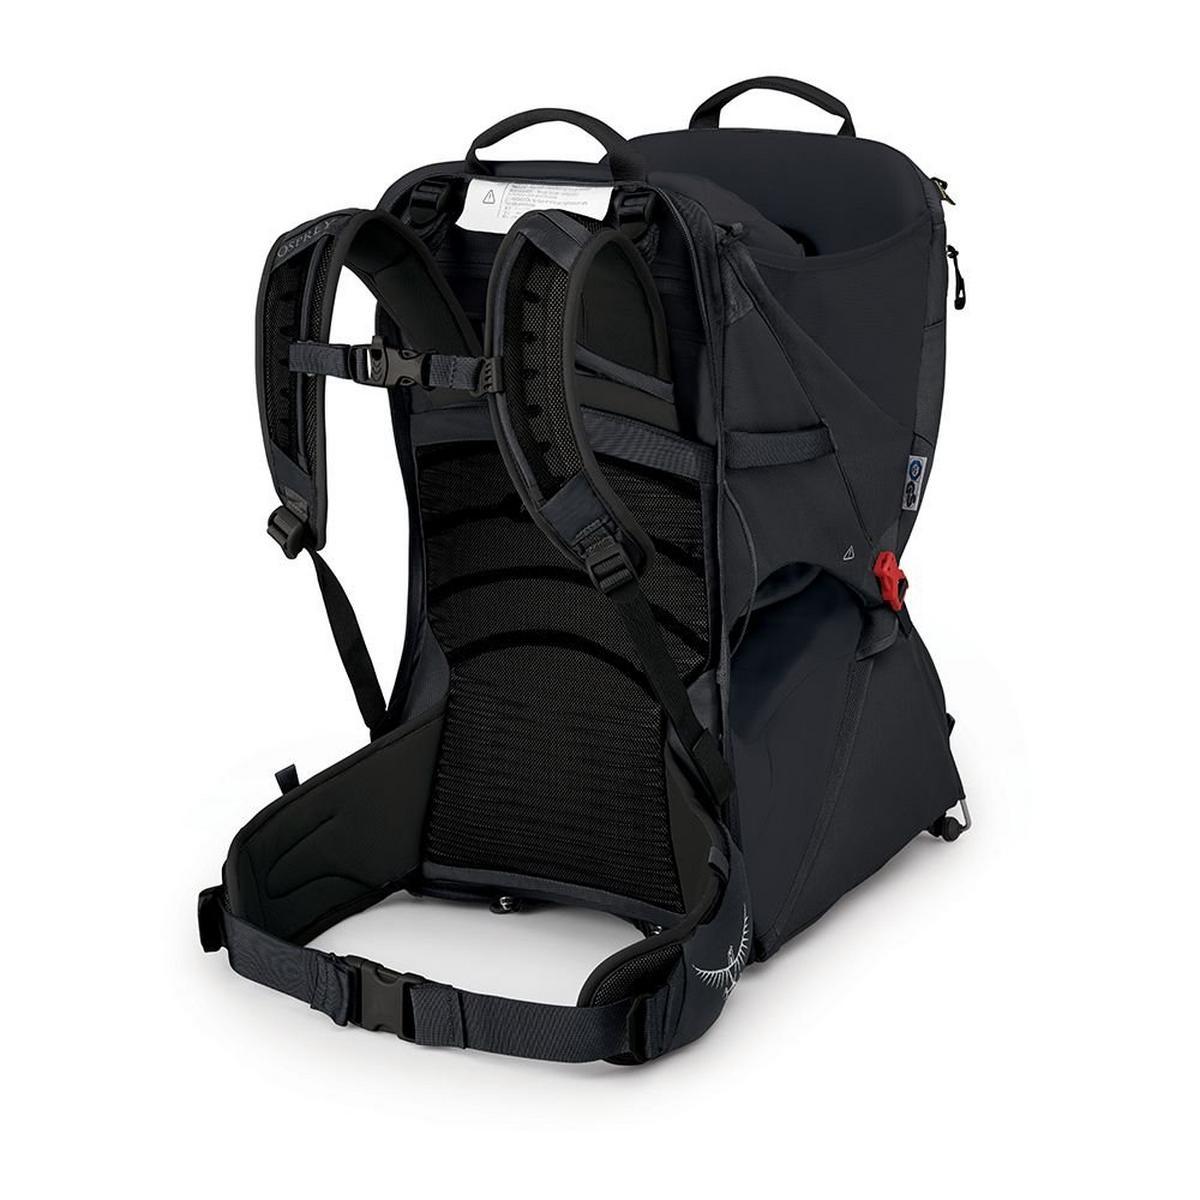 Osprey Poco LT Child Carrier - Black